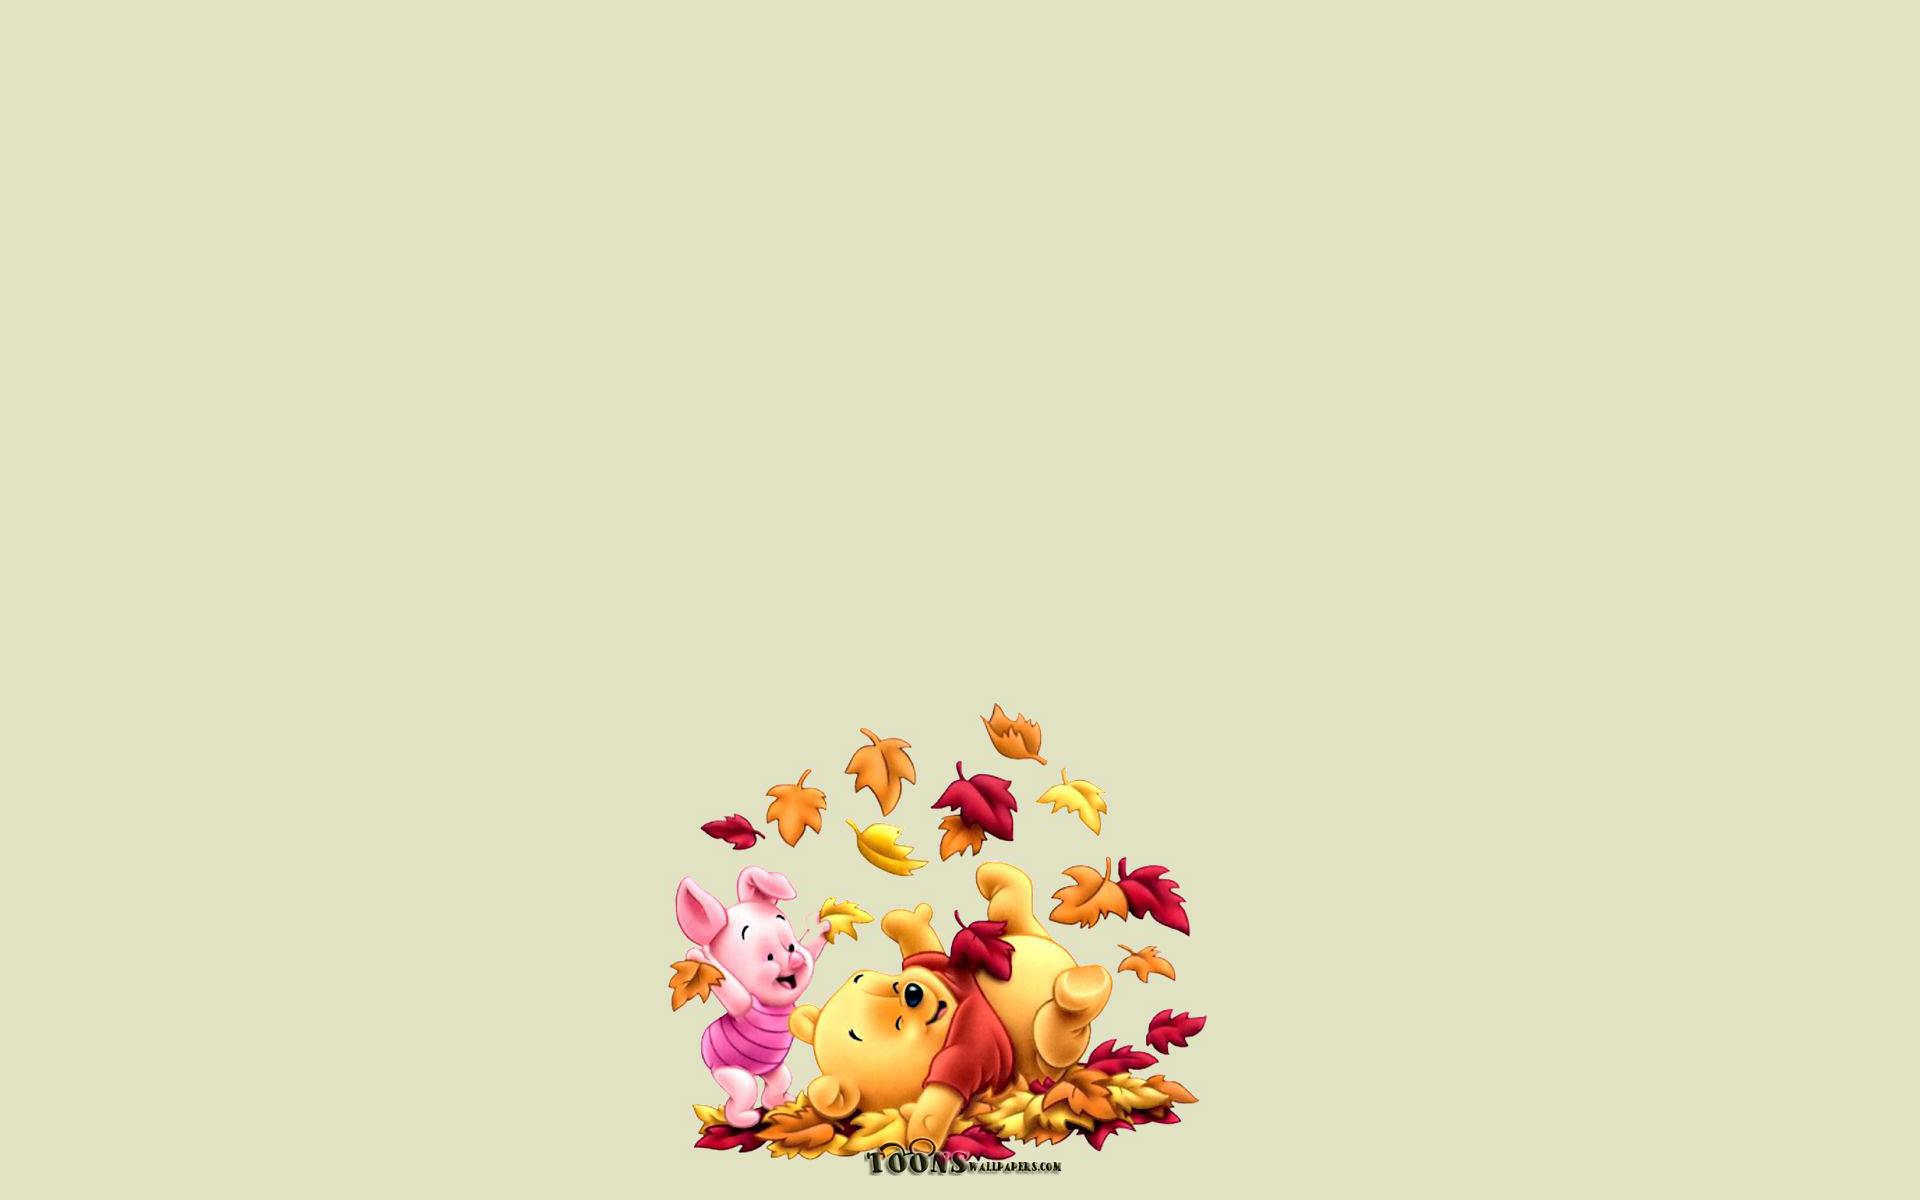 Pooh Wallpaper Iphone Winnie The Pooh Computer Wallpapers Desktop Backgrounds